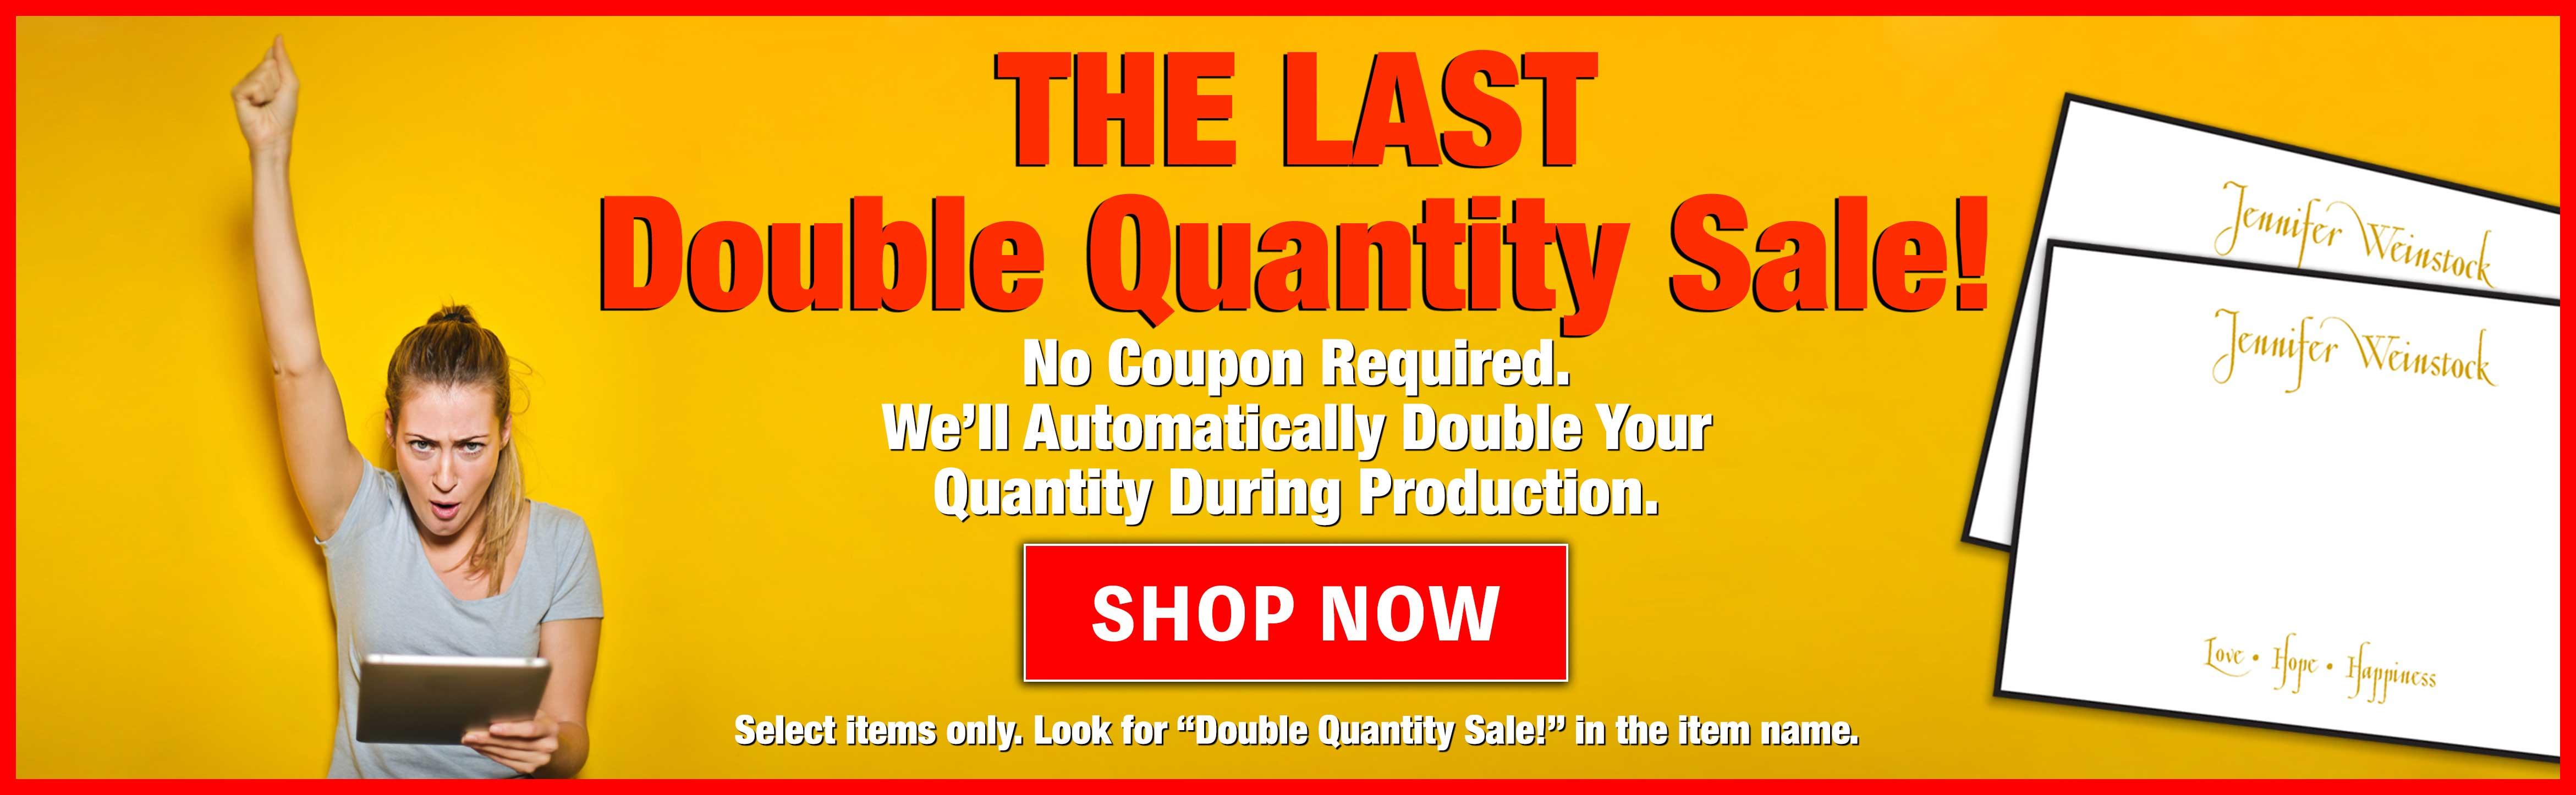 The Last Double Quantity Sale at StationeryXpress.com